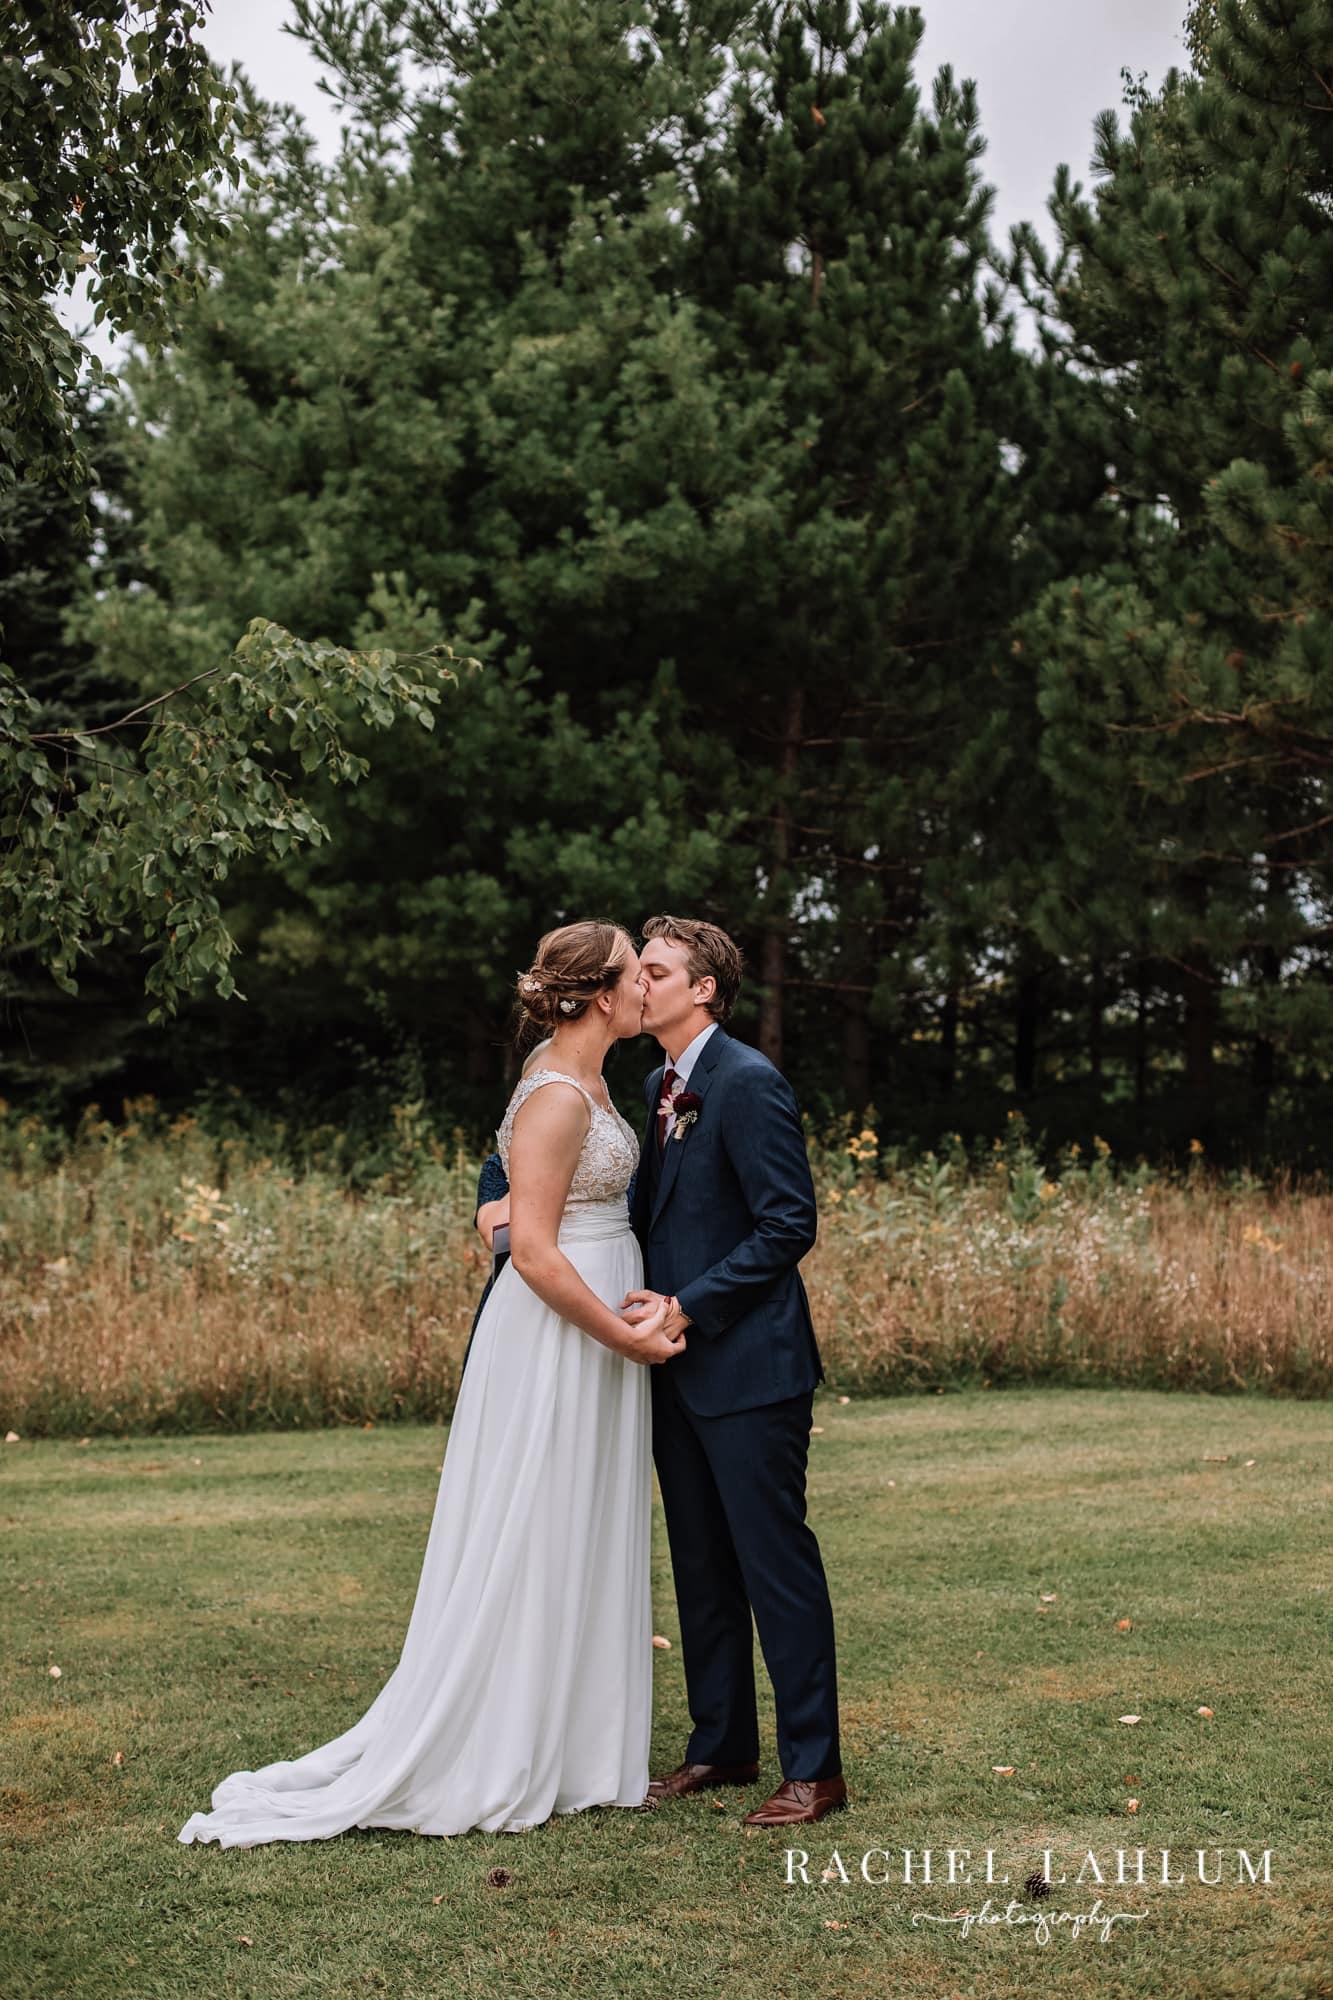 Portrait of bride and groom kissing in a field in Zimmerman, Minnesota.